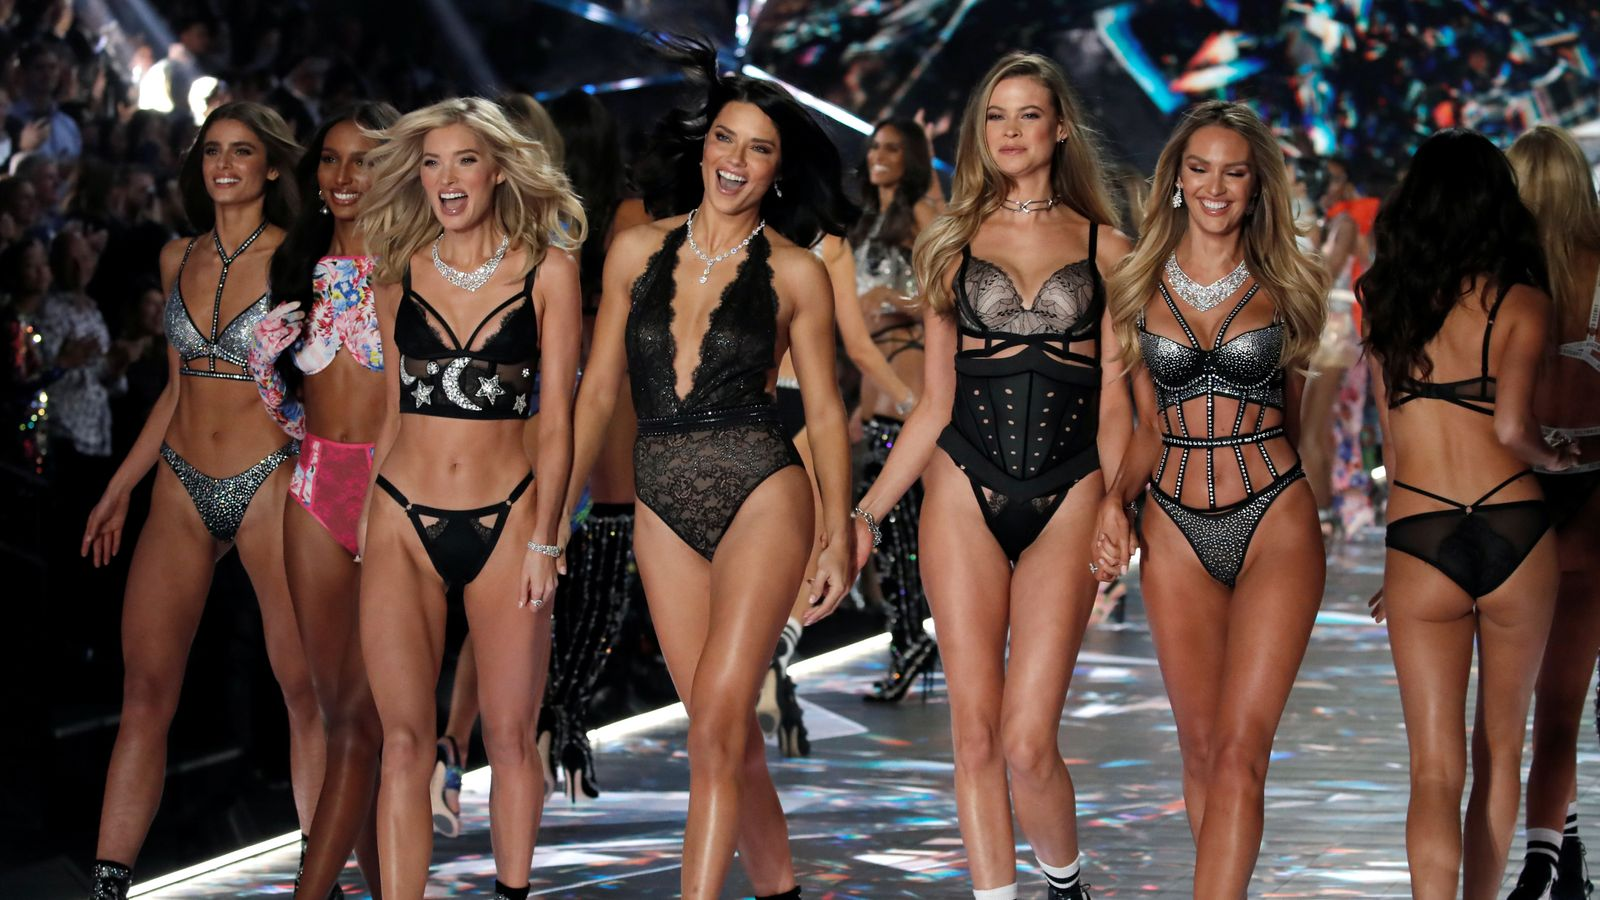 Victorias Secret boss apologises for insensitive trans and plus-size comments picture